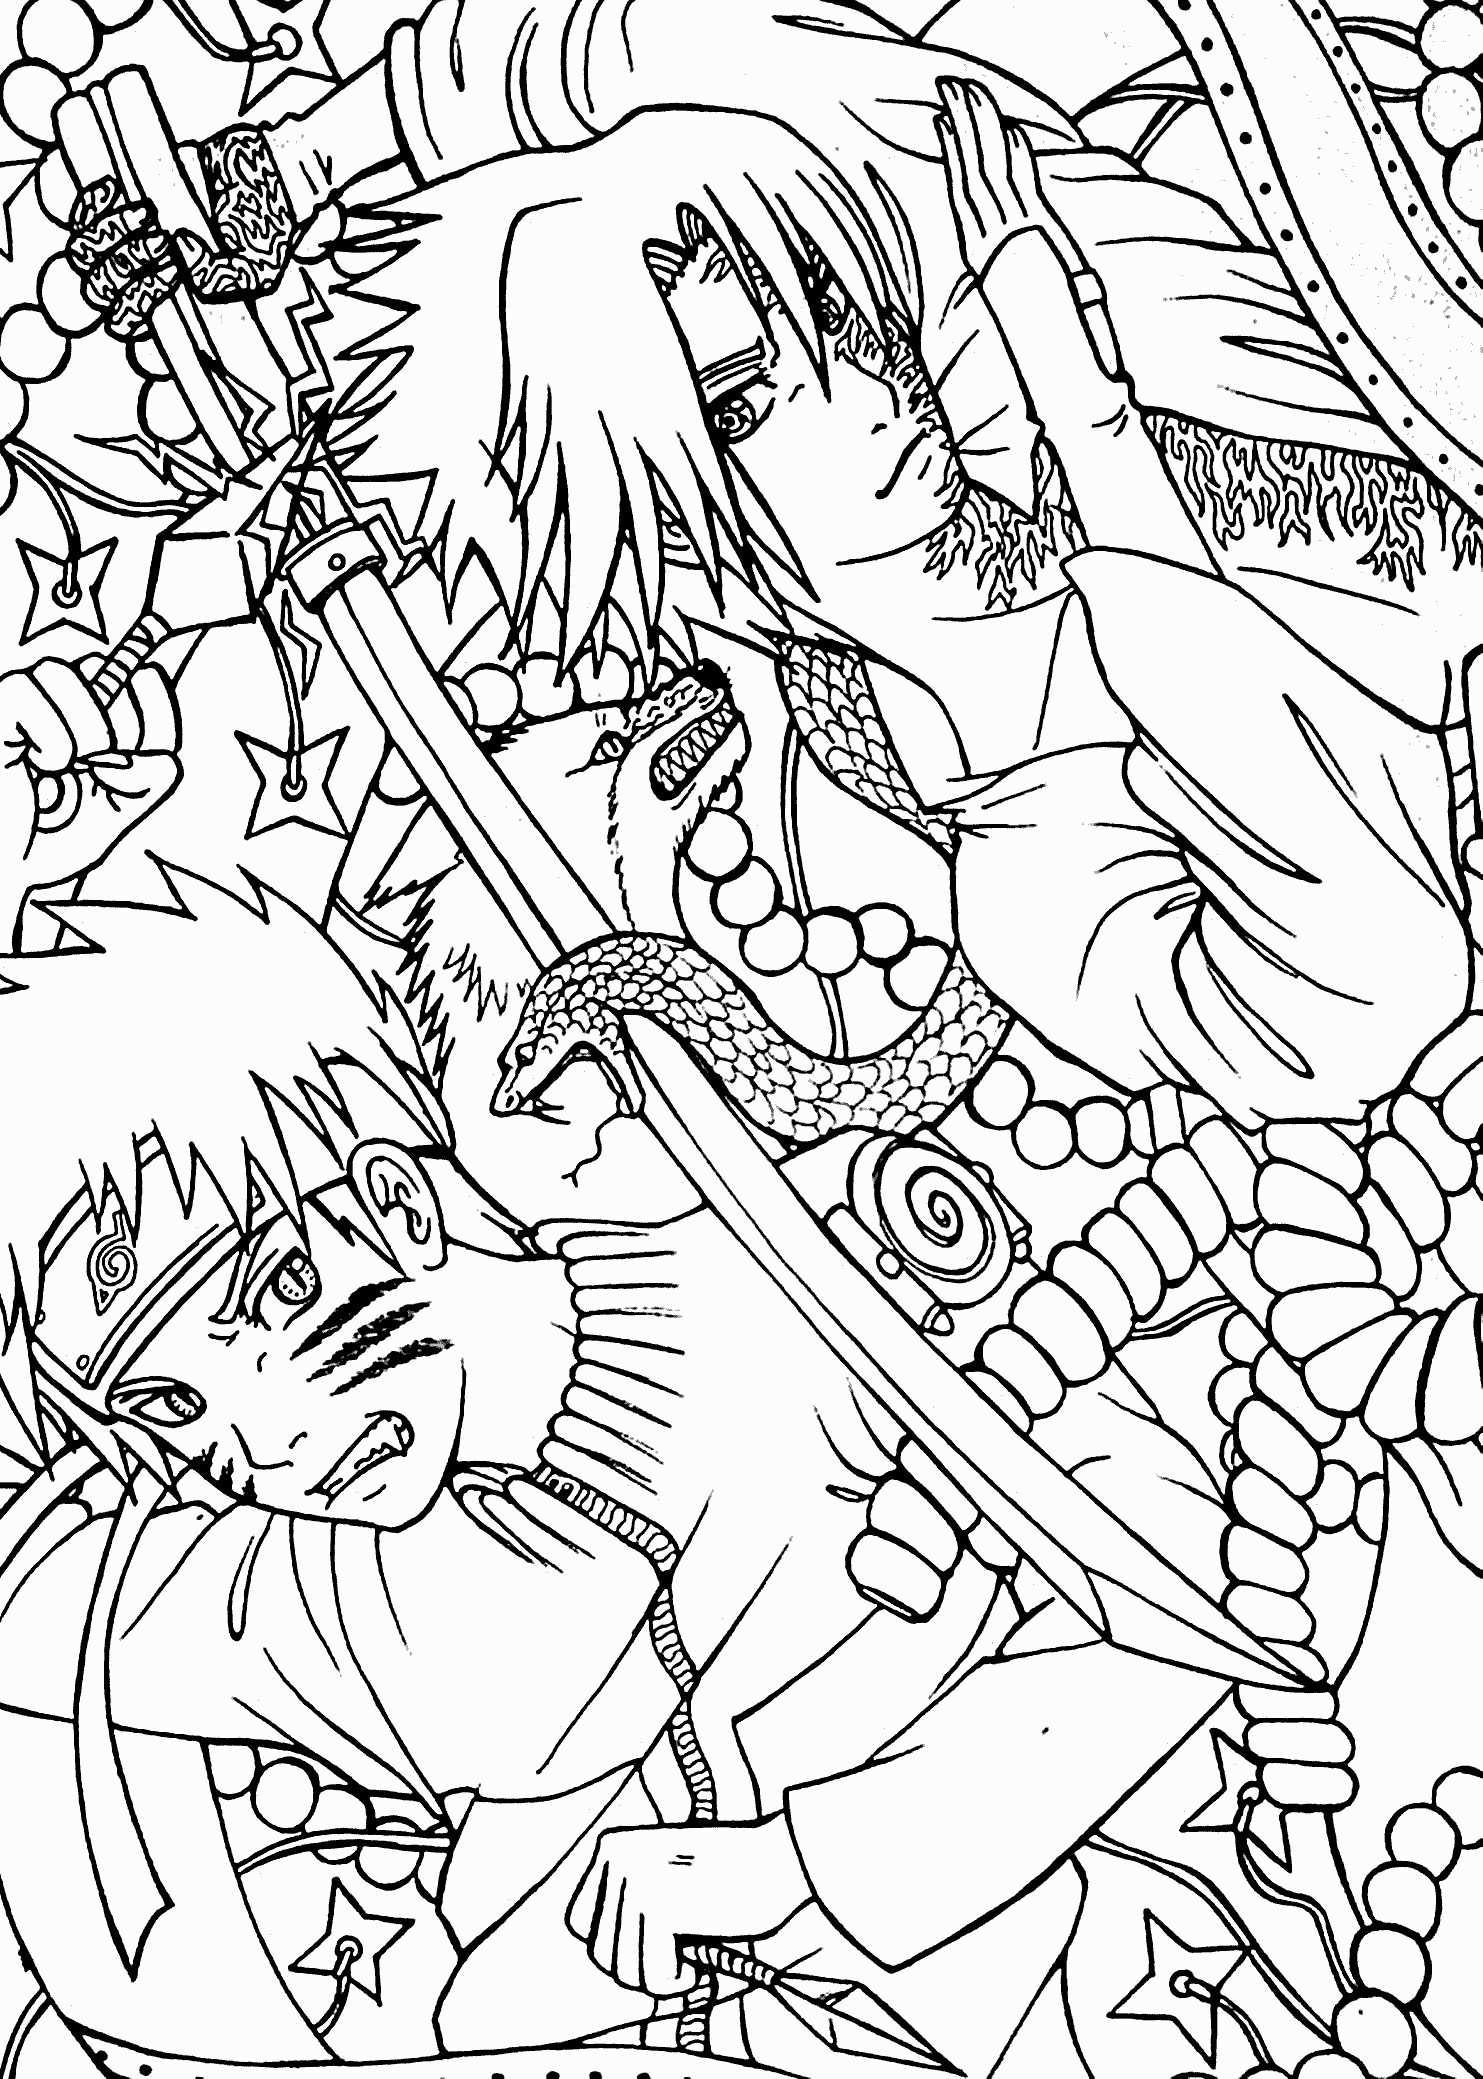 Anime Naruto Coloring Pages Naruto Coloring Pages New Naruto Coloring Pages Printable Fresh